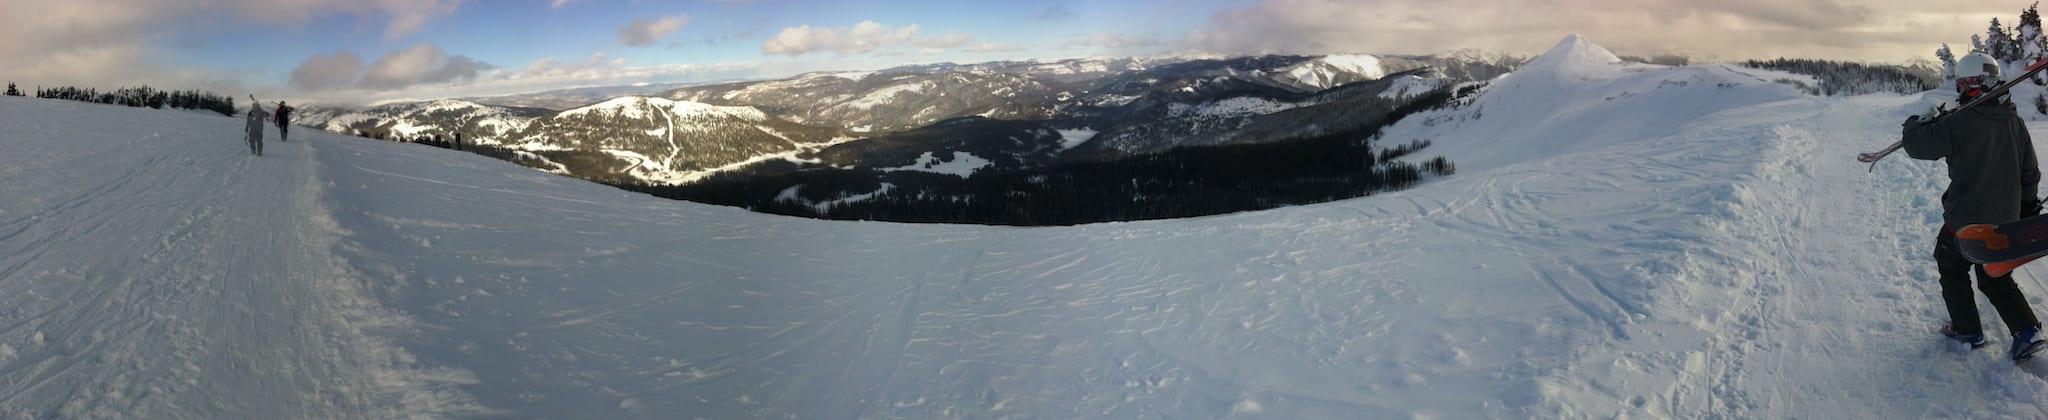 Wolf Creek Ski Area Ridge Colorado Panorama